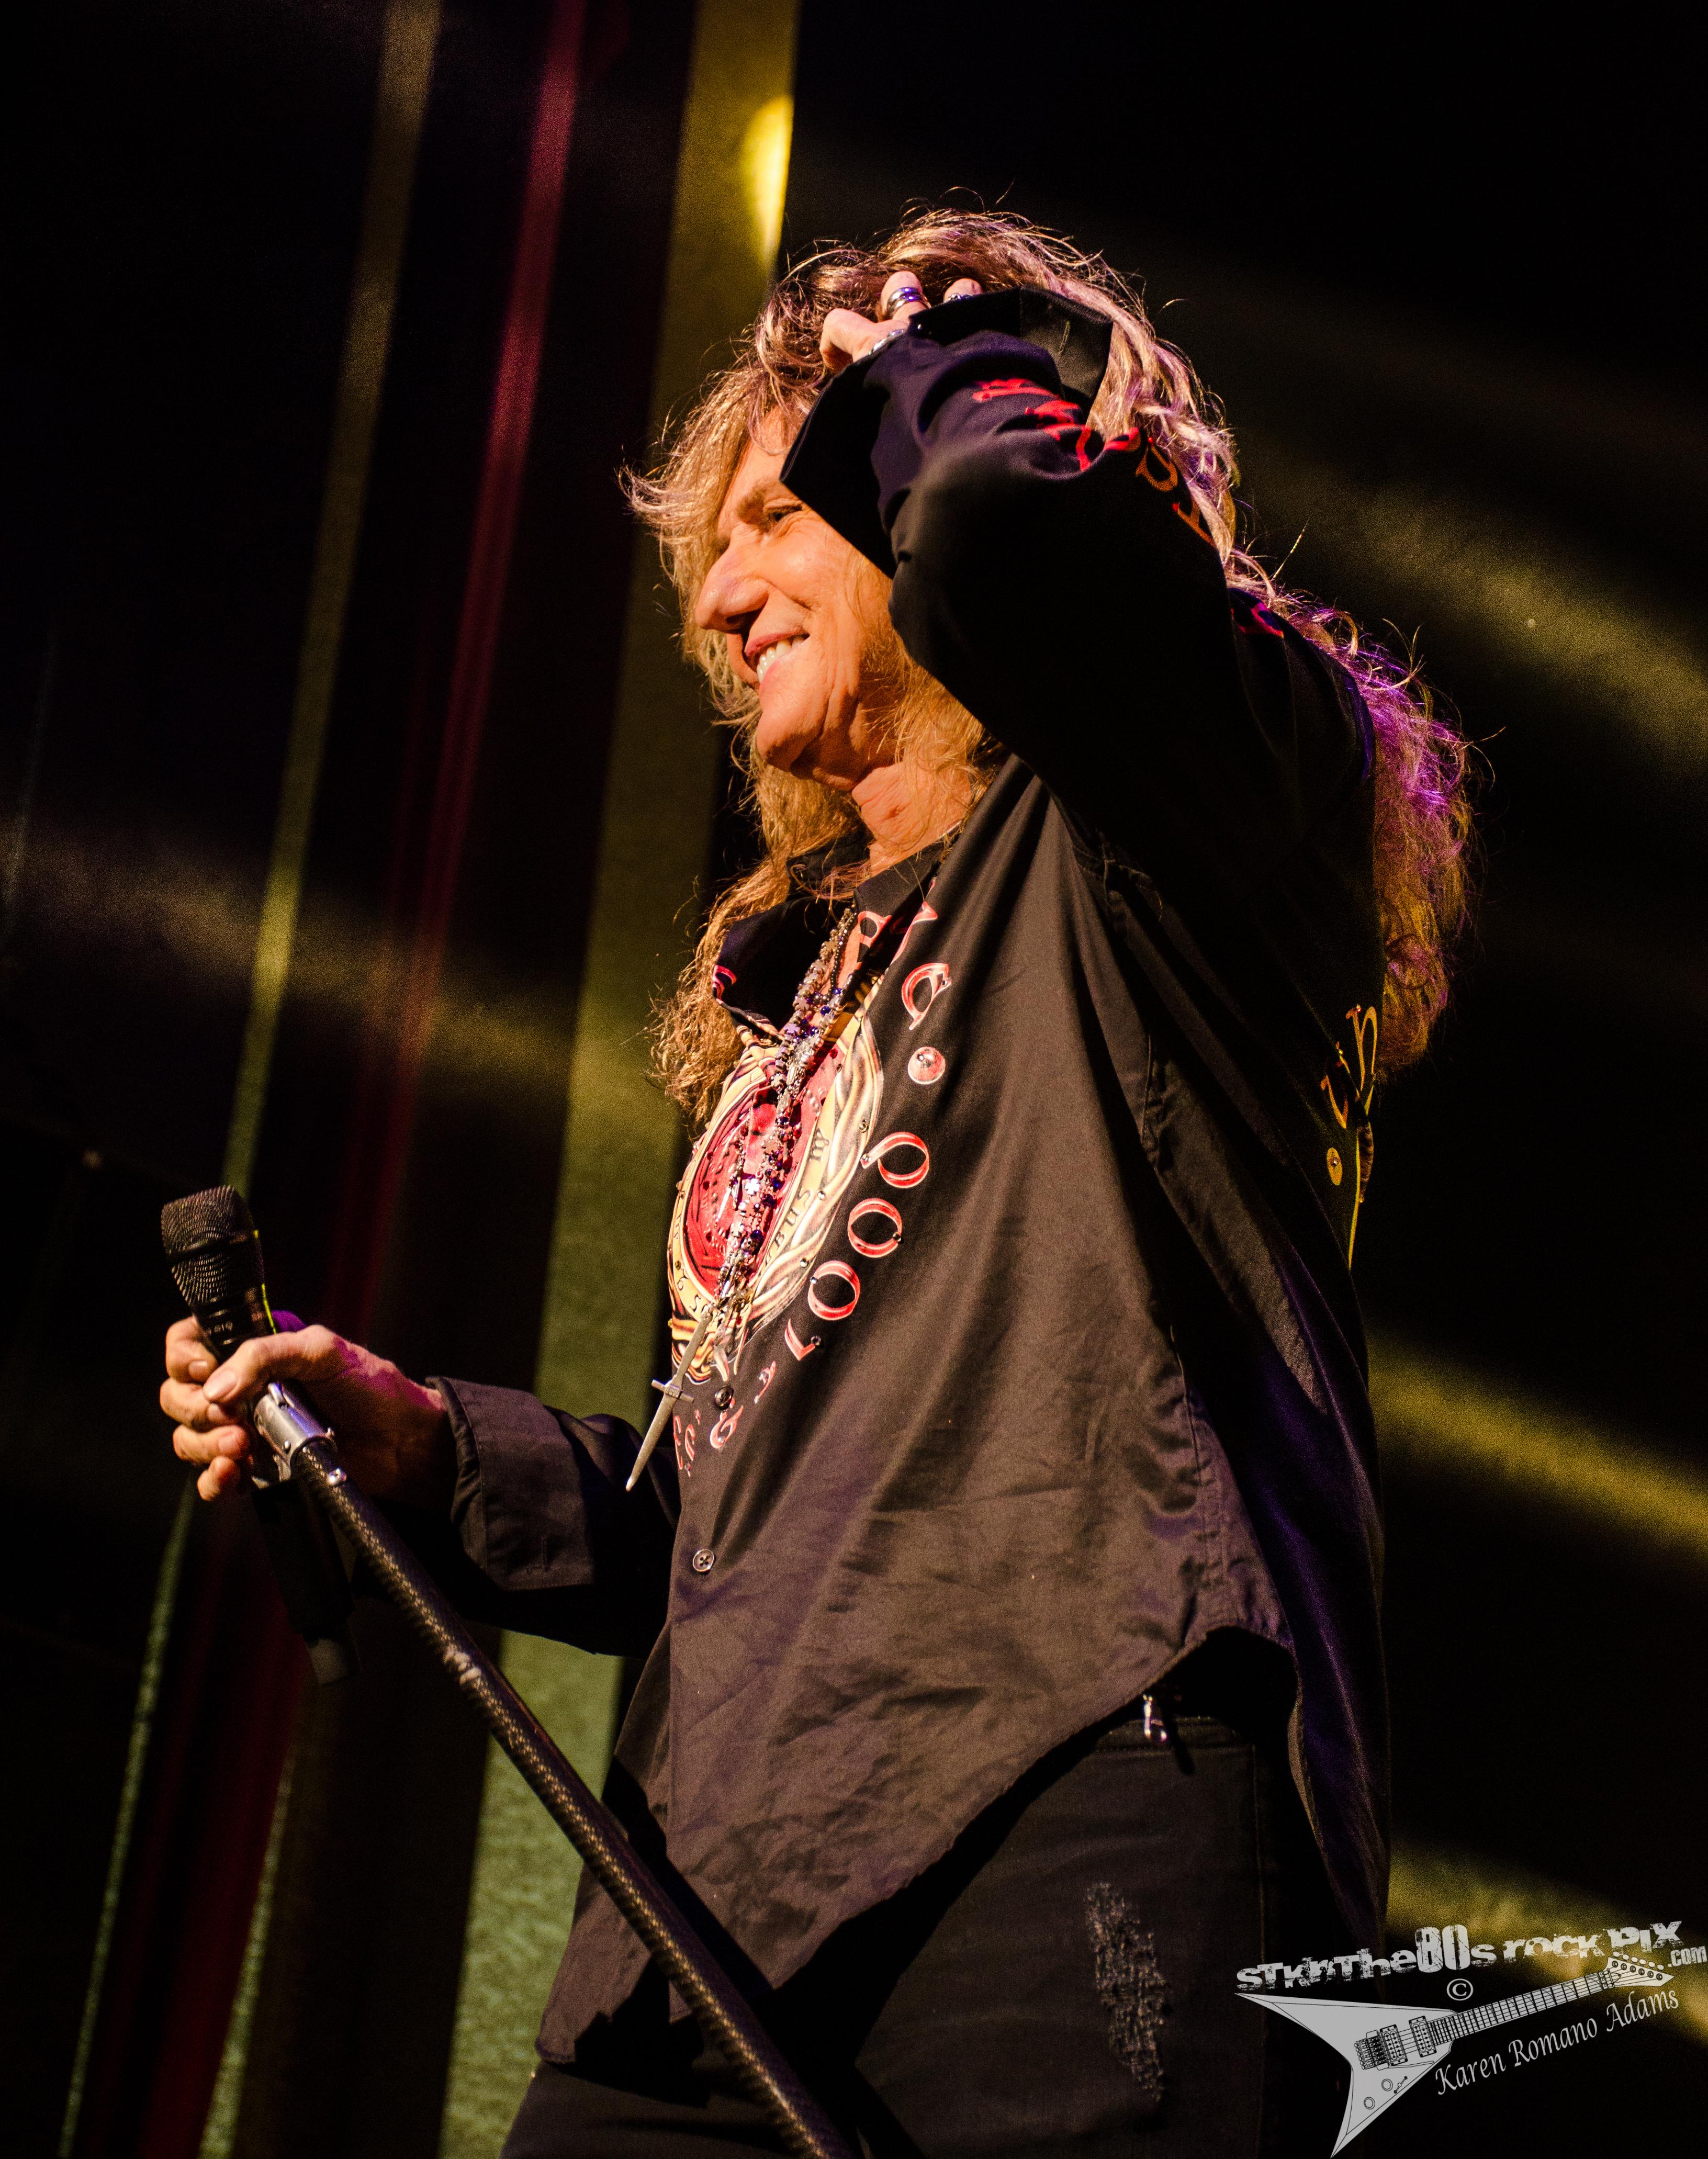 Whitesnake at Hard Rock Live 4-19-14